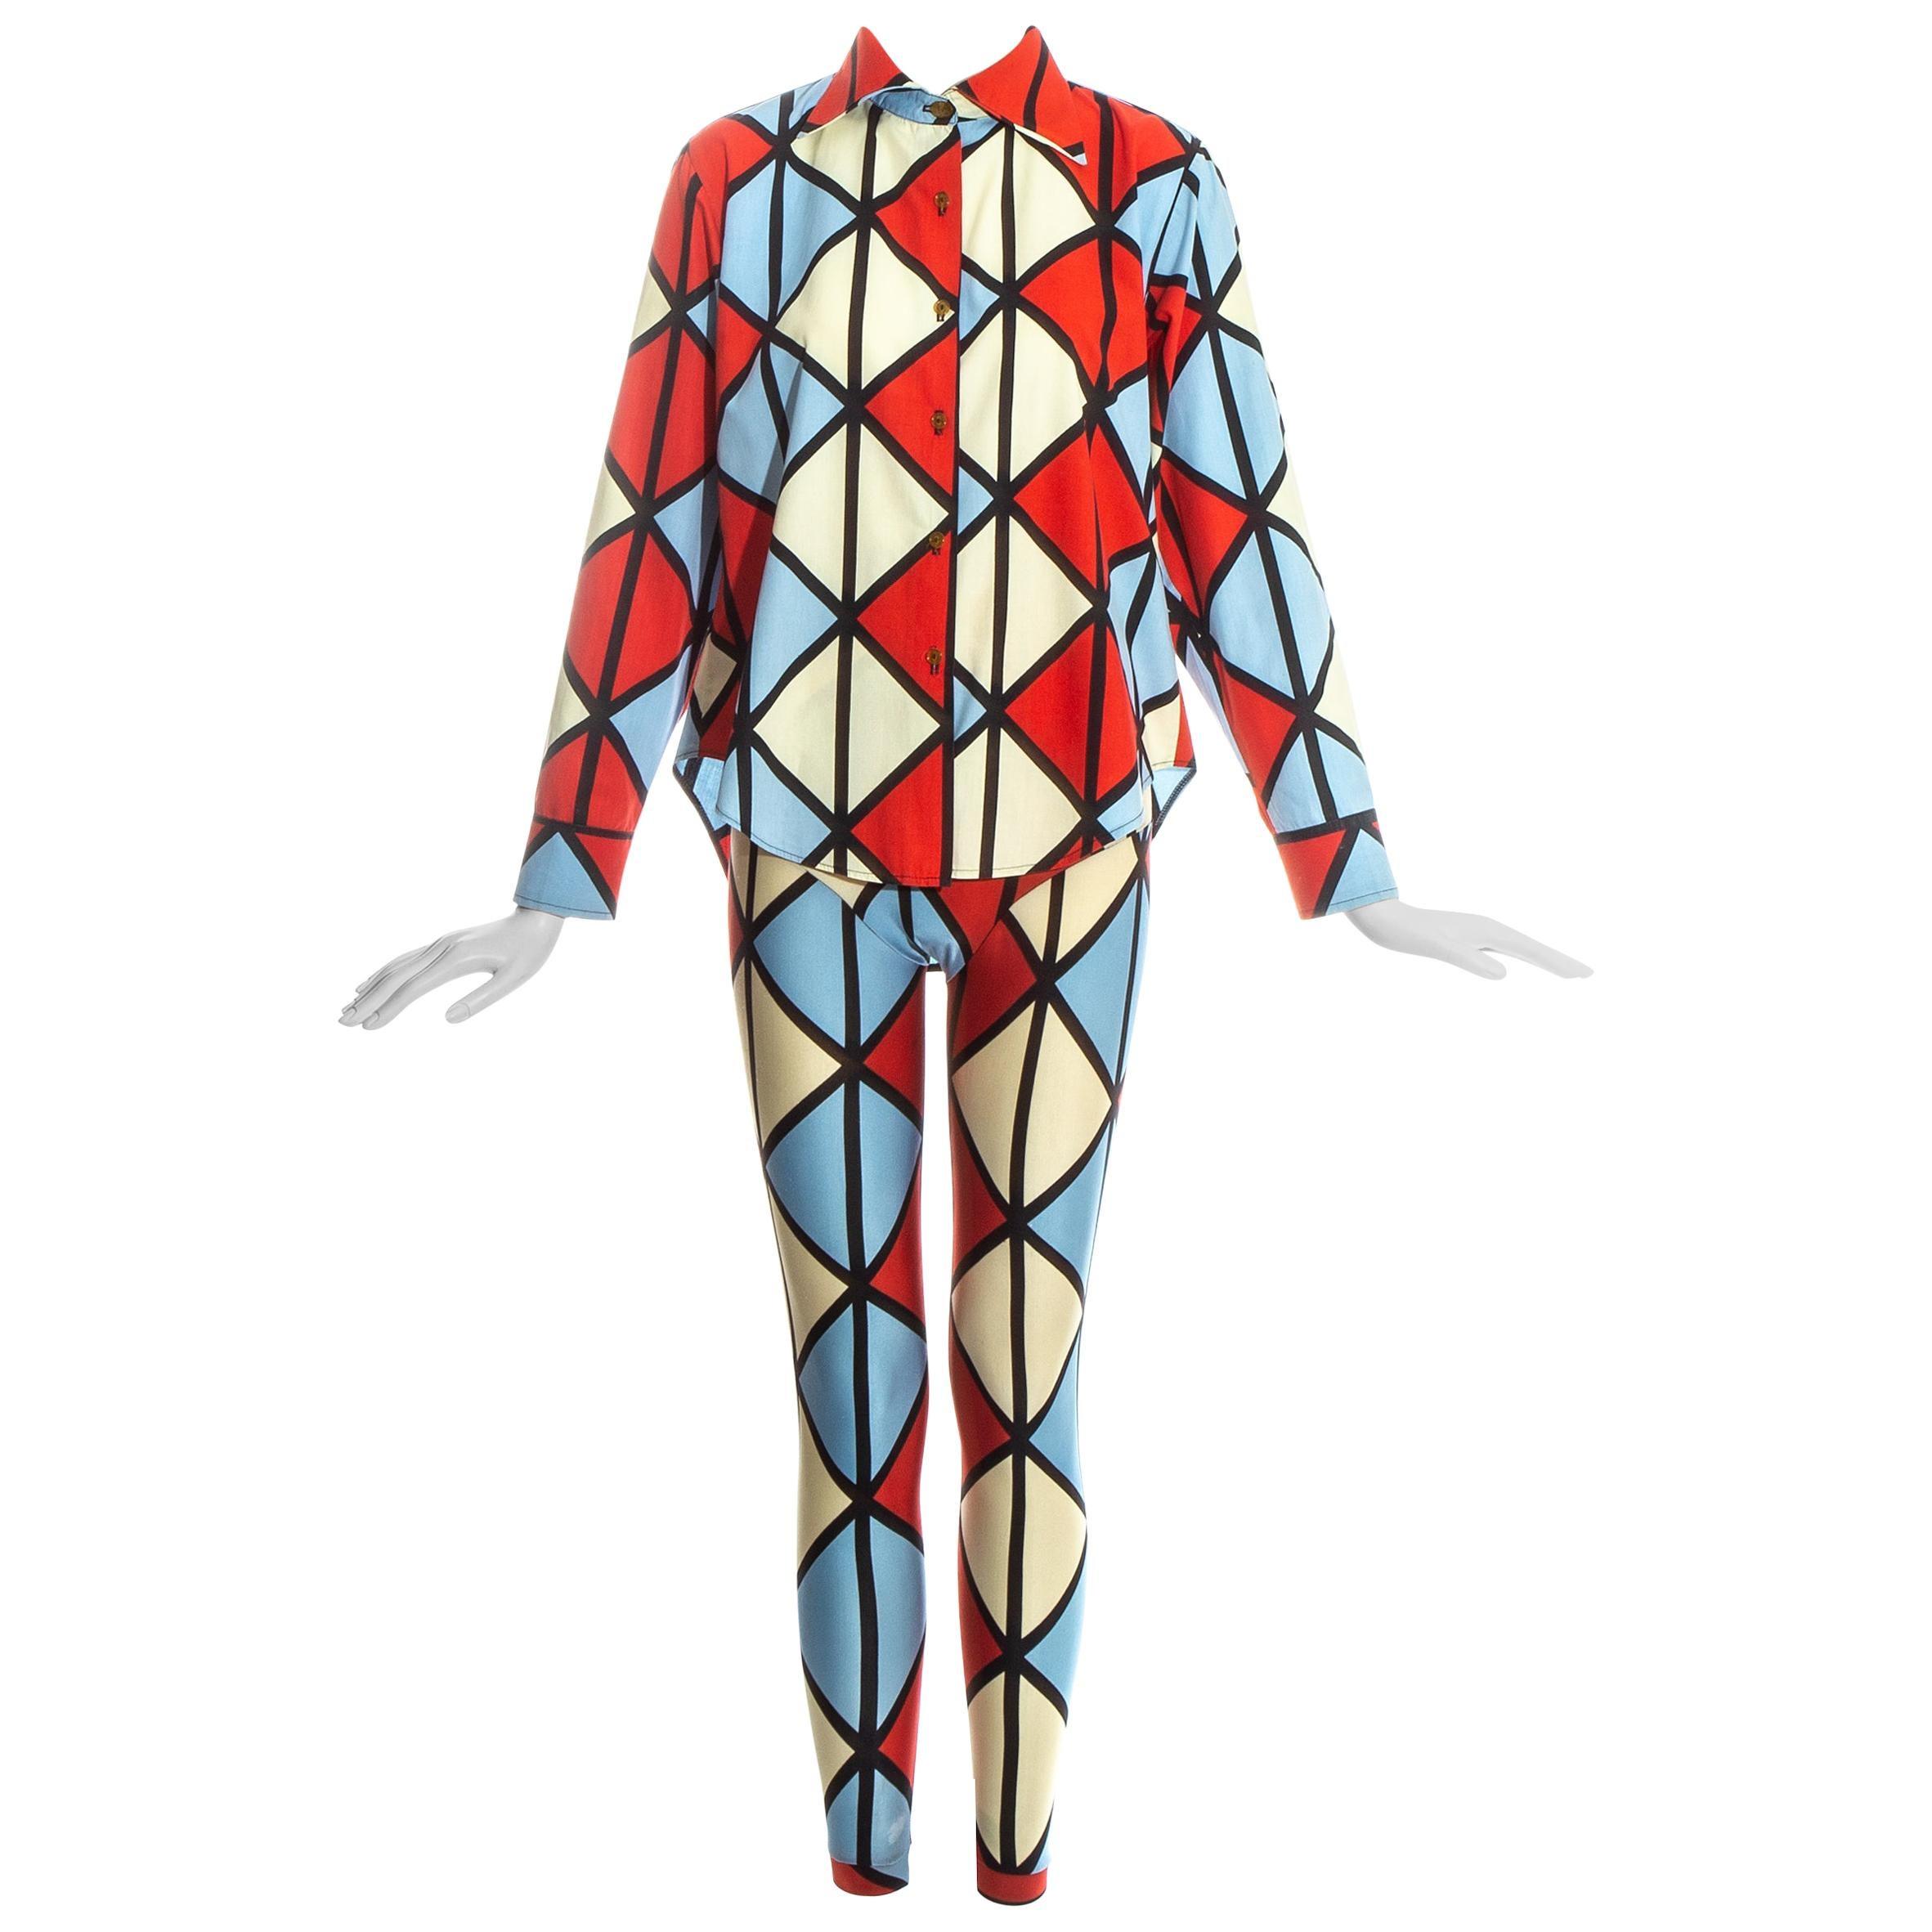 Vivienne Westwood 'Voyage to Cythera' harlequin leggings and shirt set, fw 1989